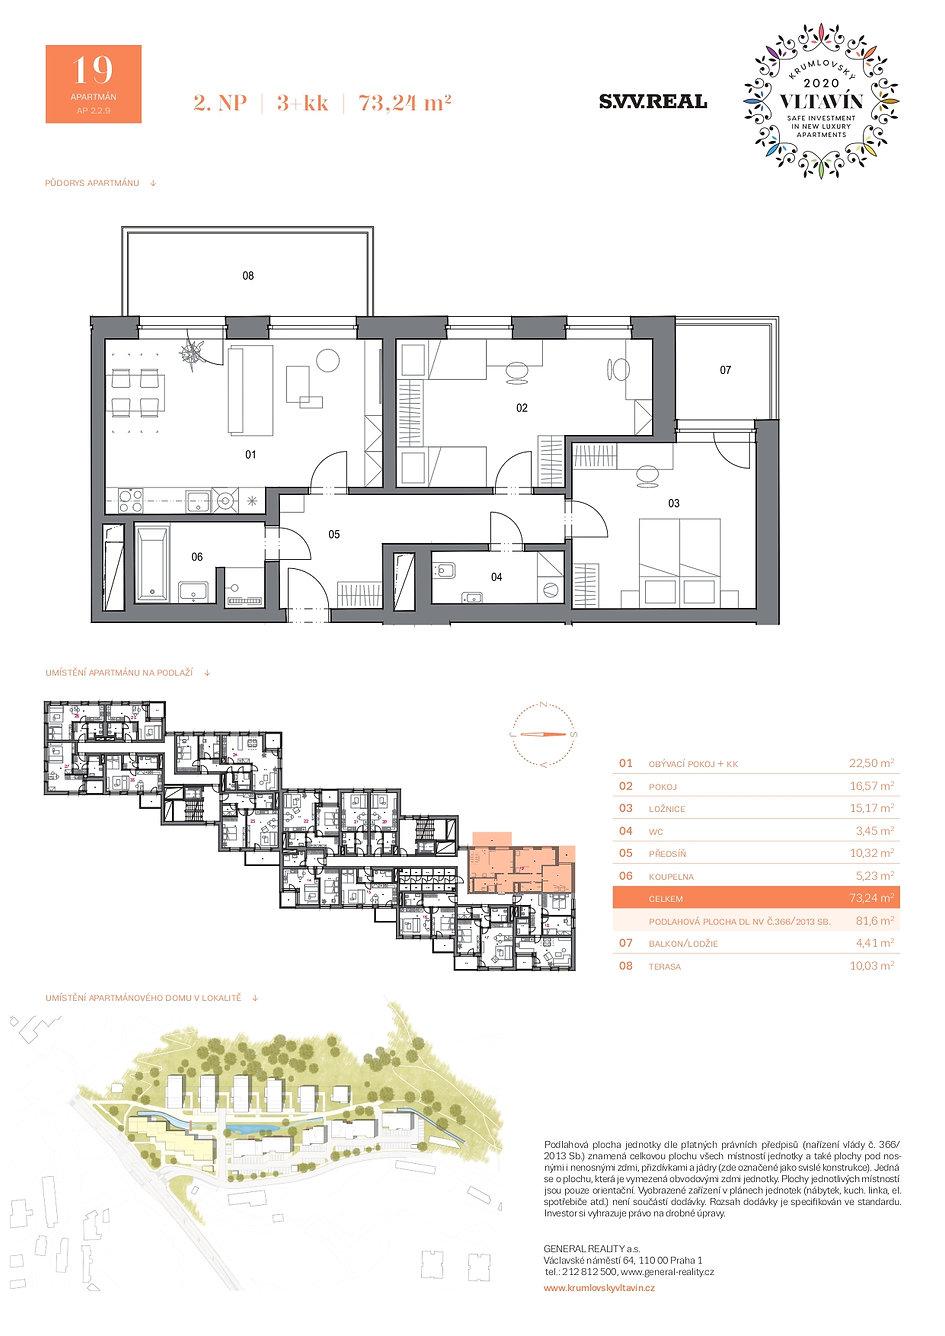 GR_krumlovsky-vltavin_bytove-karty-apartmany_2NP_A19_page-0001.jpg